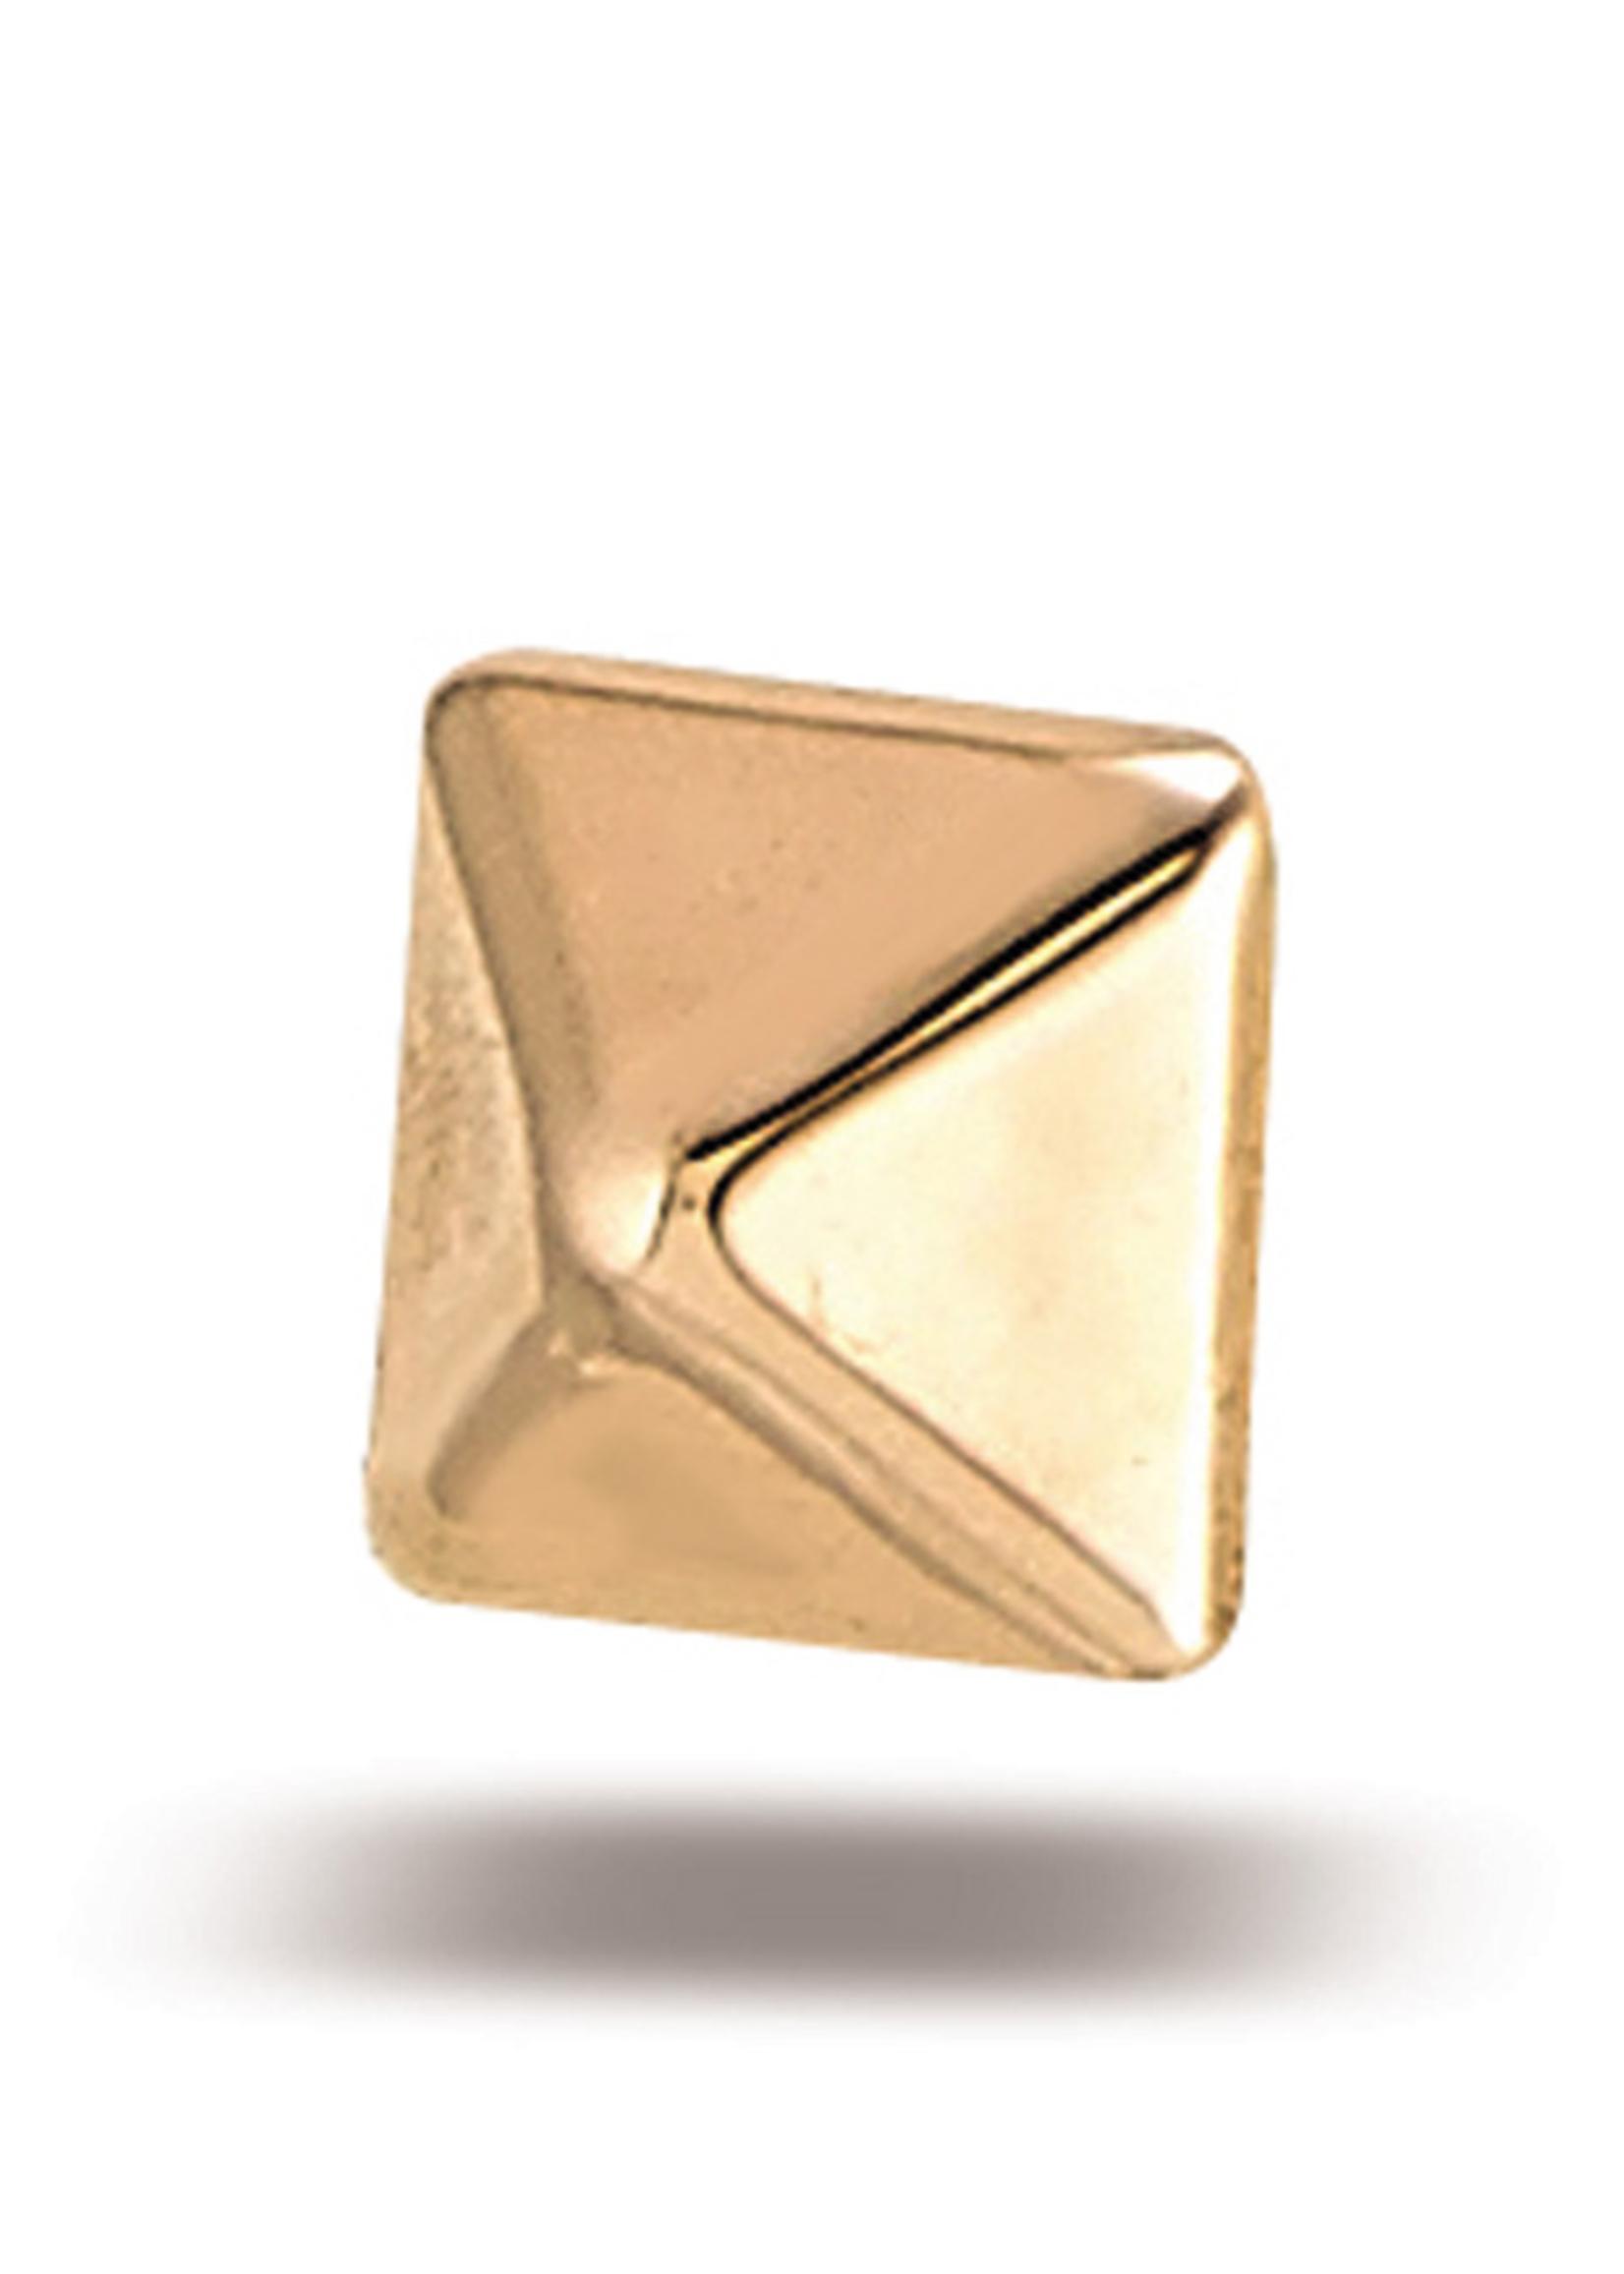 14k Rose Gold Pyramid (3.25mm)